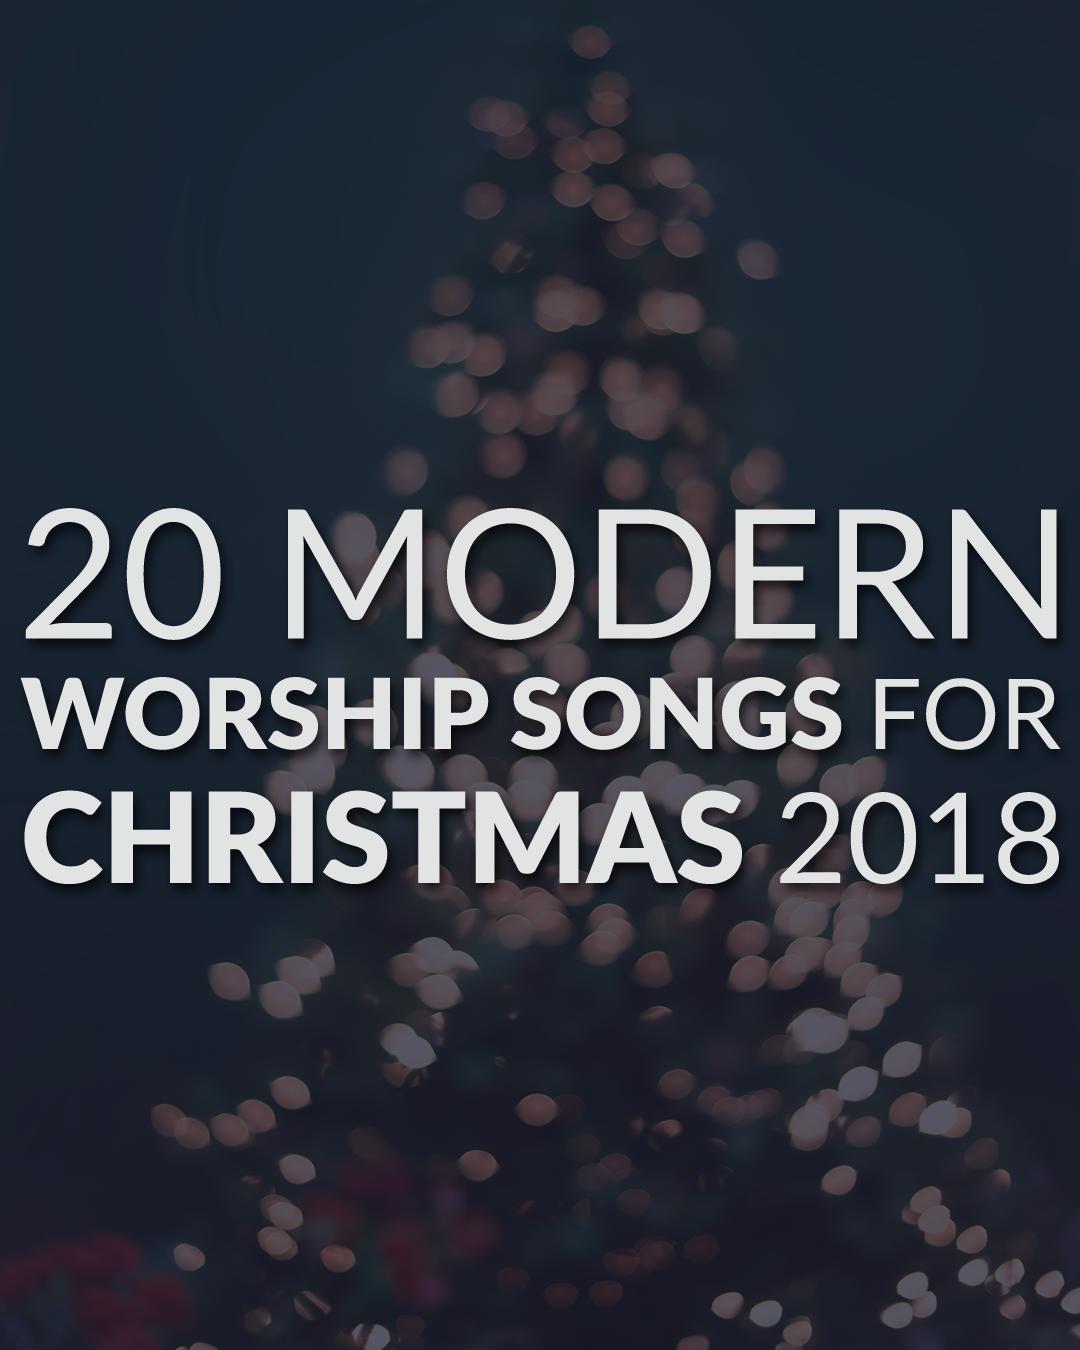 20 Modern Worship Songs For Christmas 2018 — Leading Worship